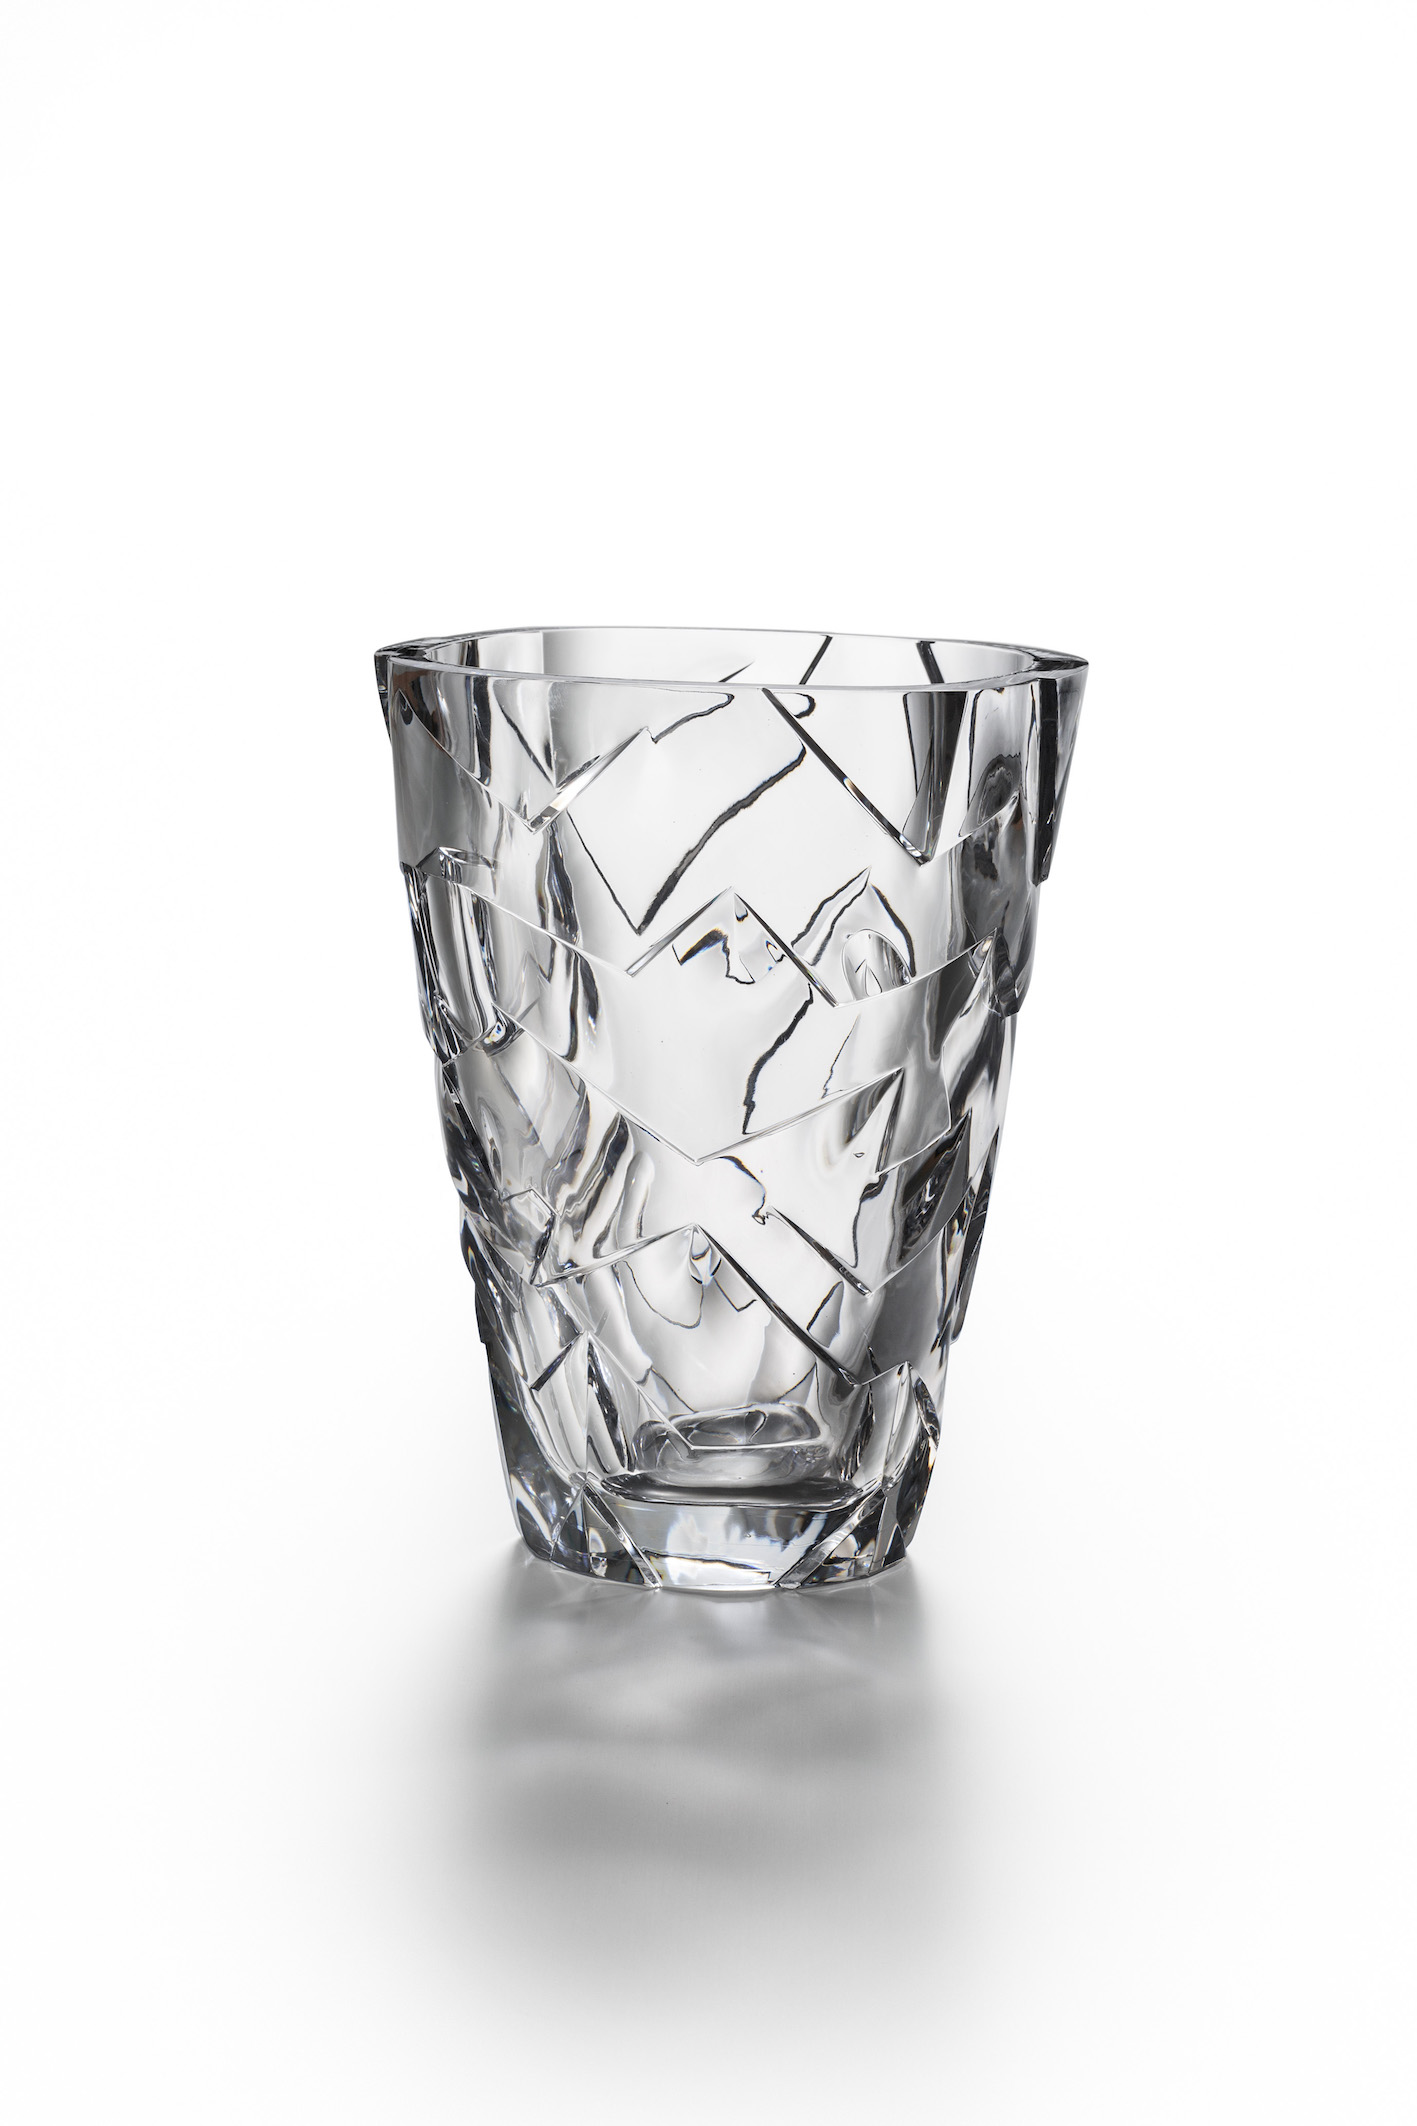 Arttu Brummer, Finlandia Vase, 1945.